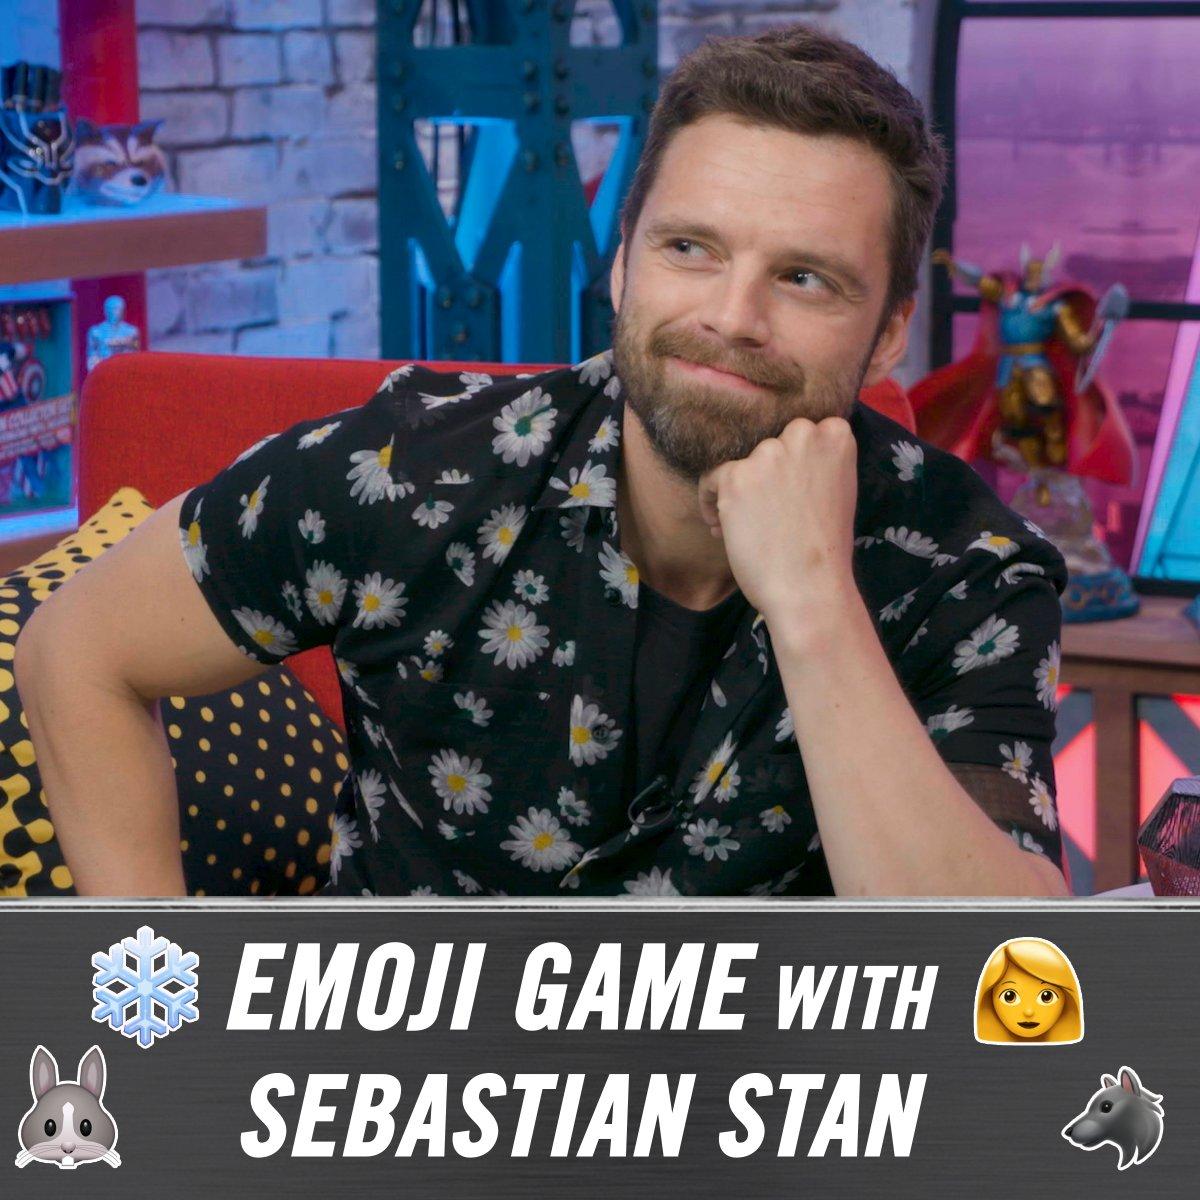 �� + ❄️ = ? Play the Emoji Game with Sebastian Stan! #InfinityWar https://t.co/Ipo1GyoSZE